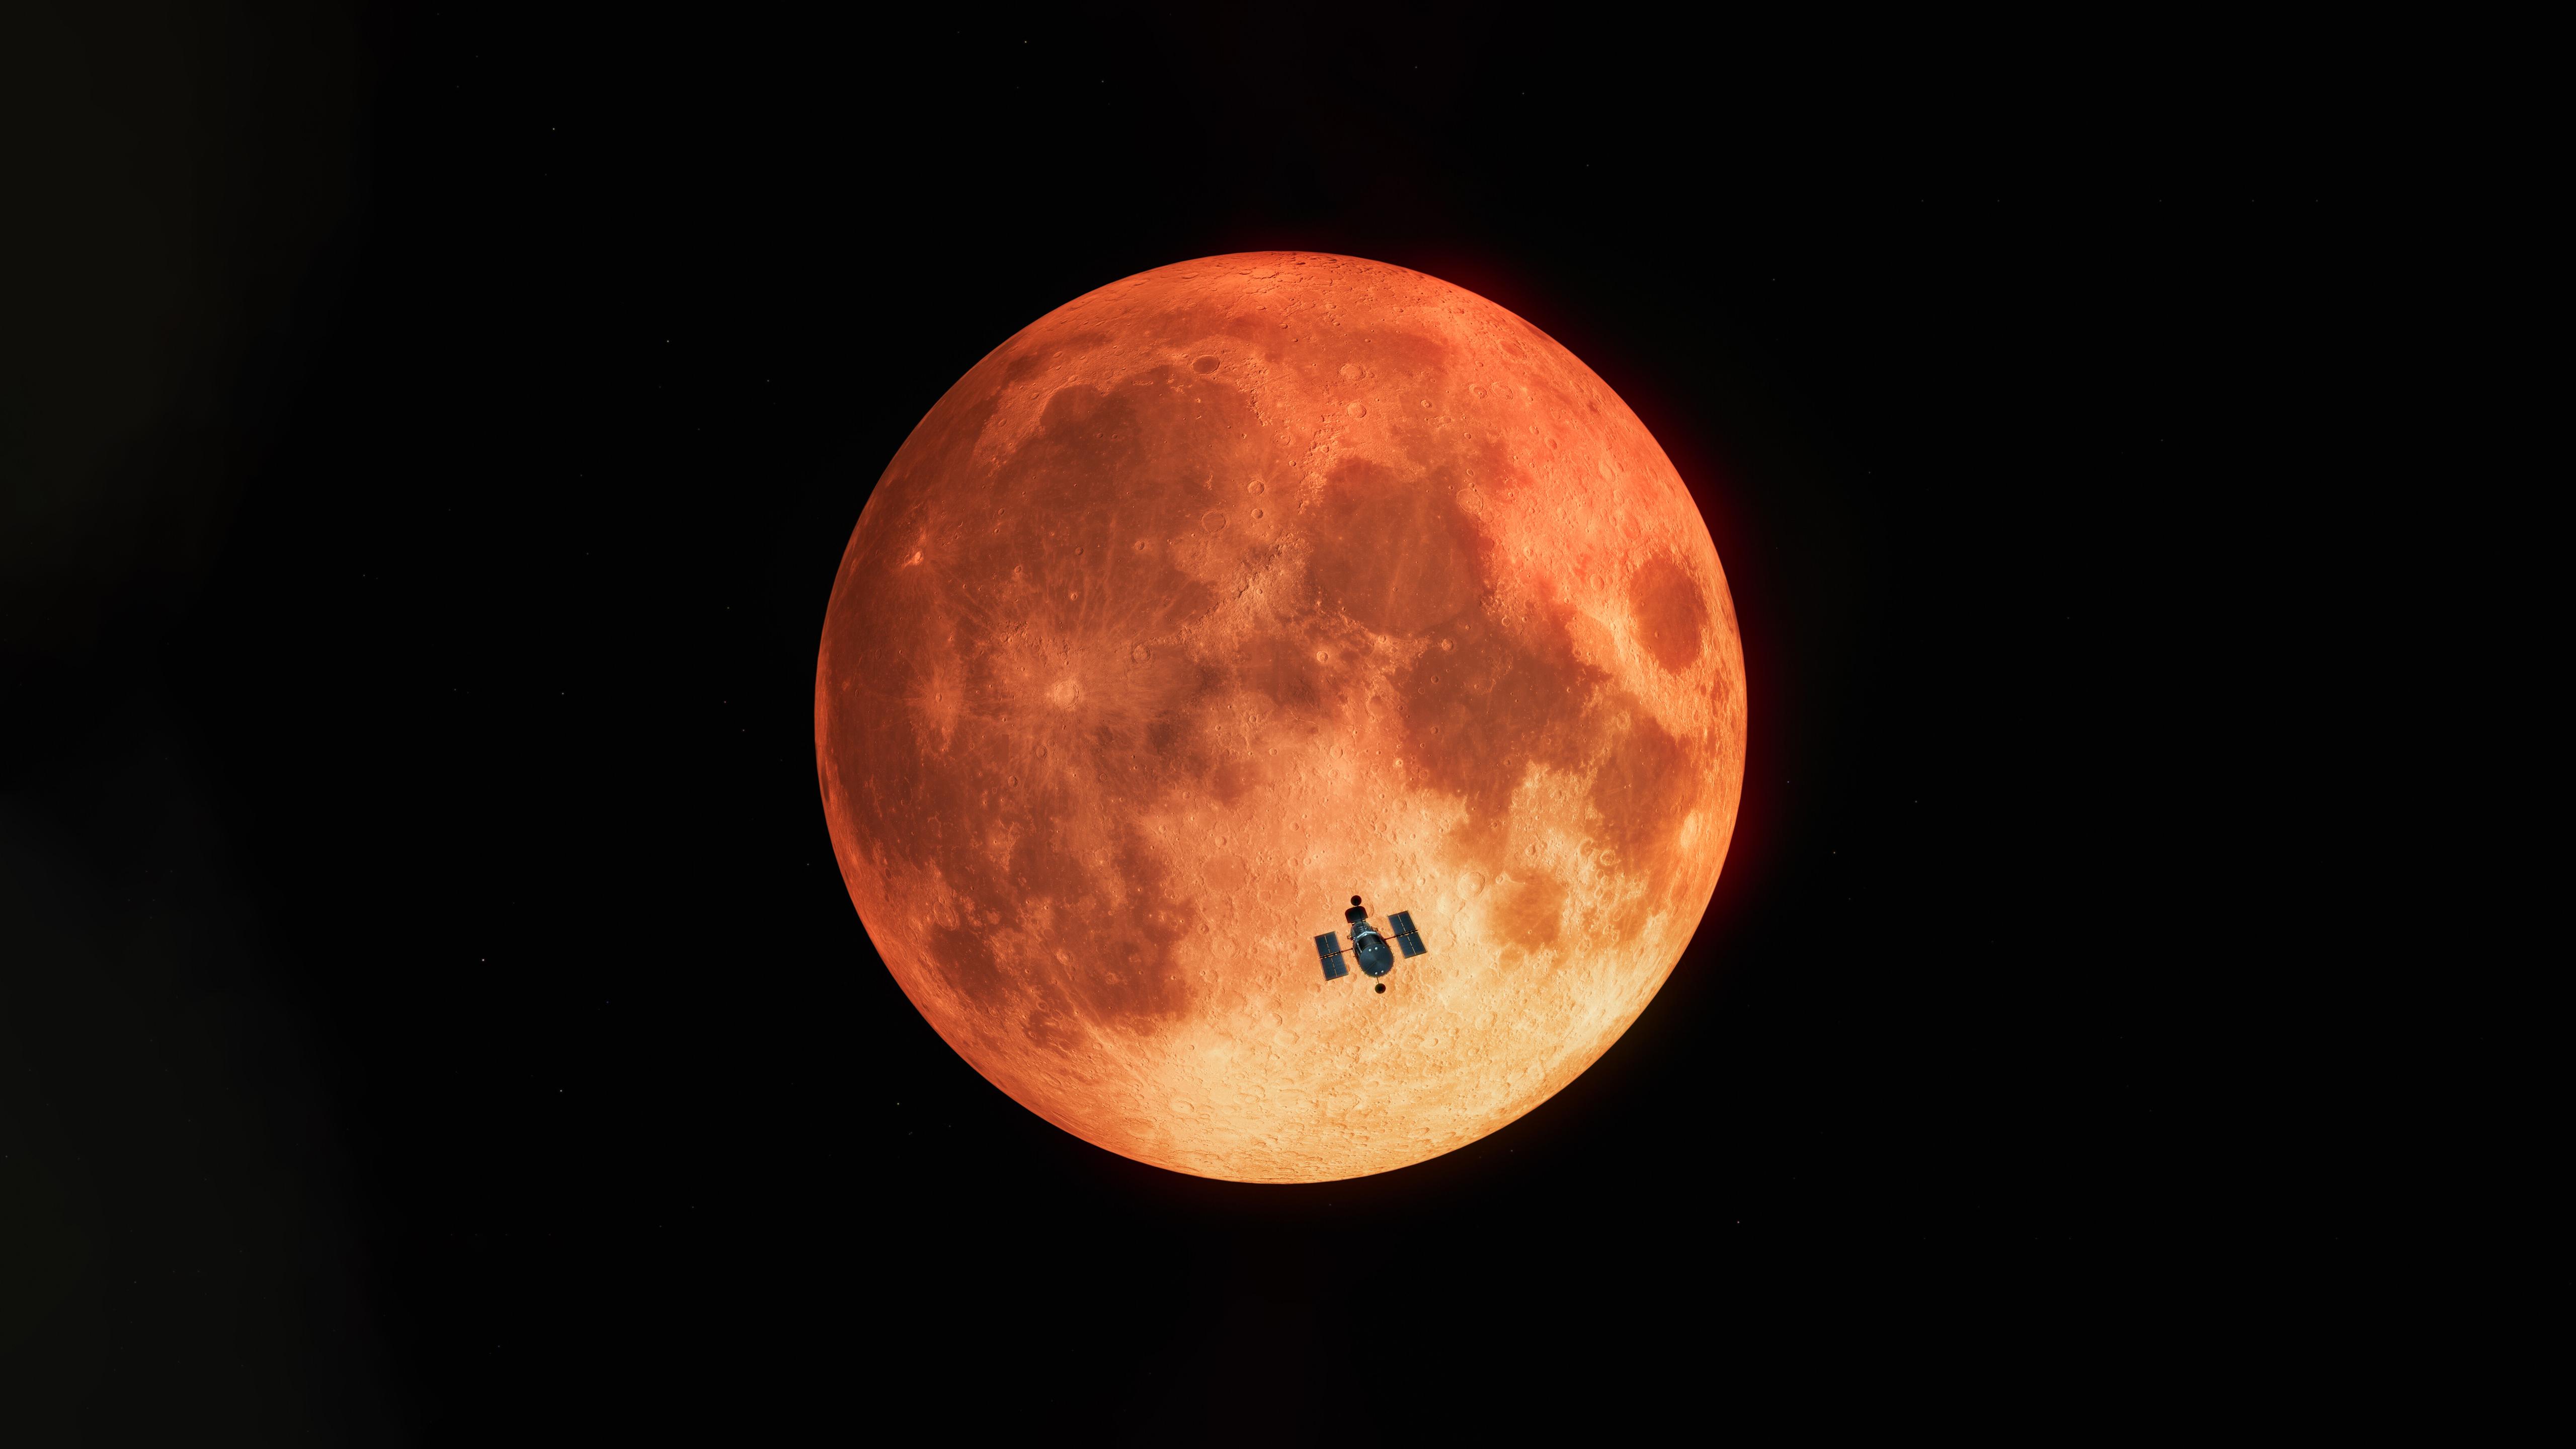 moon lunar eclipse dark 4k 1629255909 - Moon Lunar Eclipse Dark 4k - Moon Lunar Eclipse Dark wallpapers, Moon Lunar Eclipse Dark 4k wallpapers